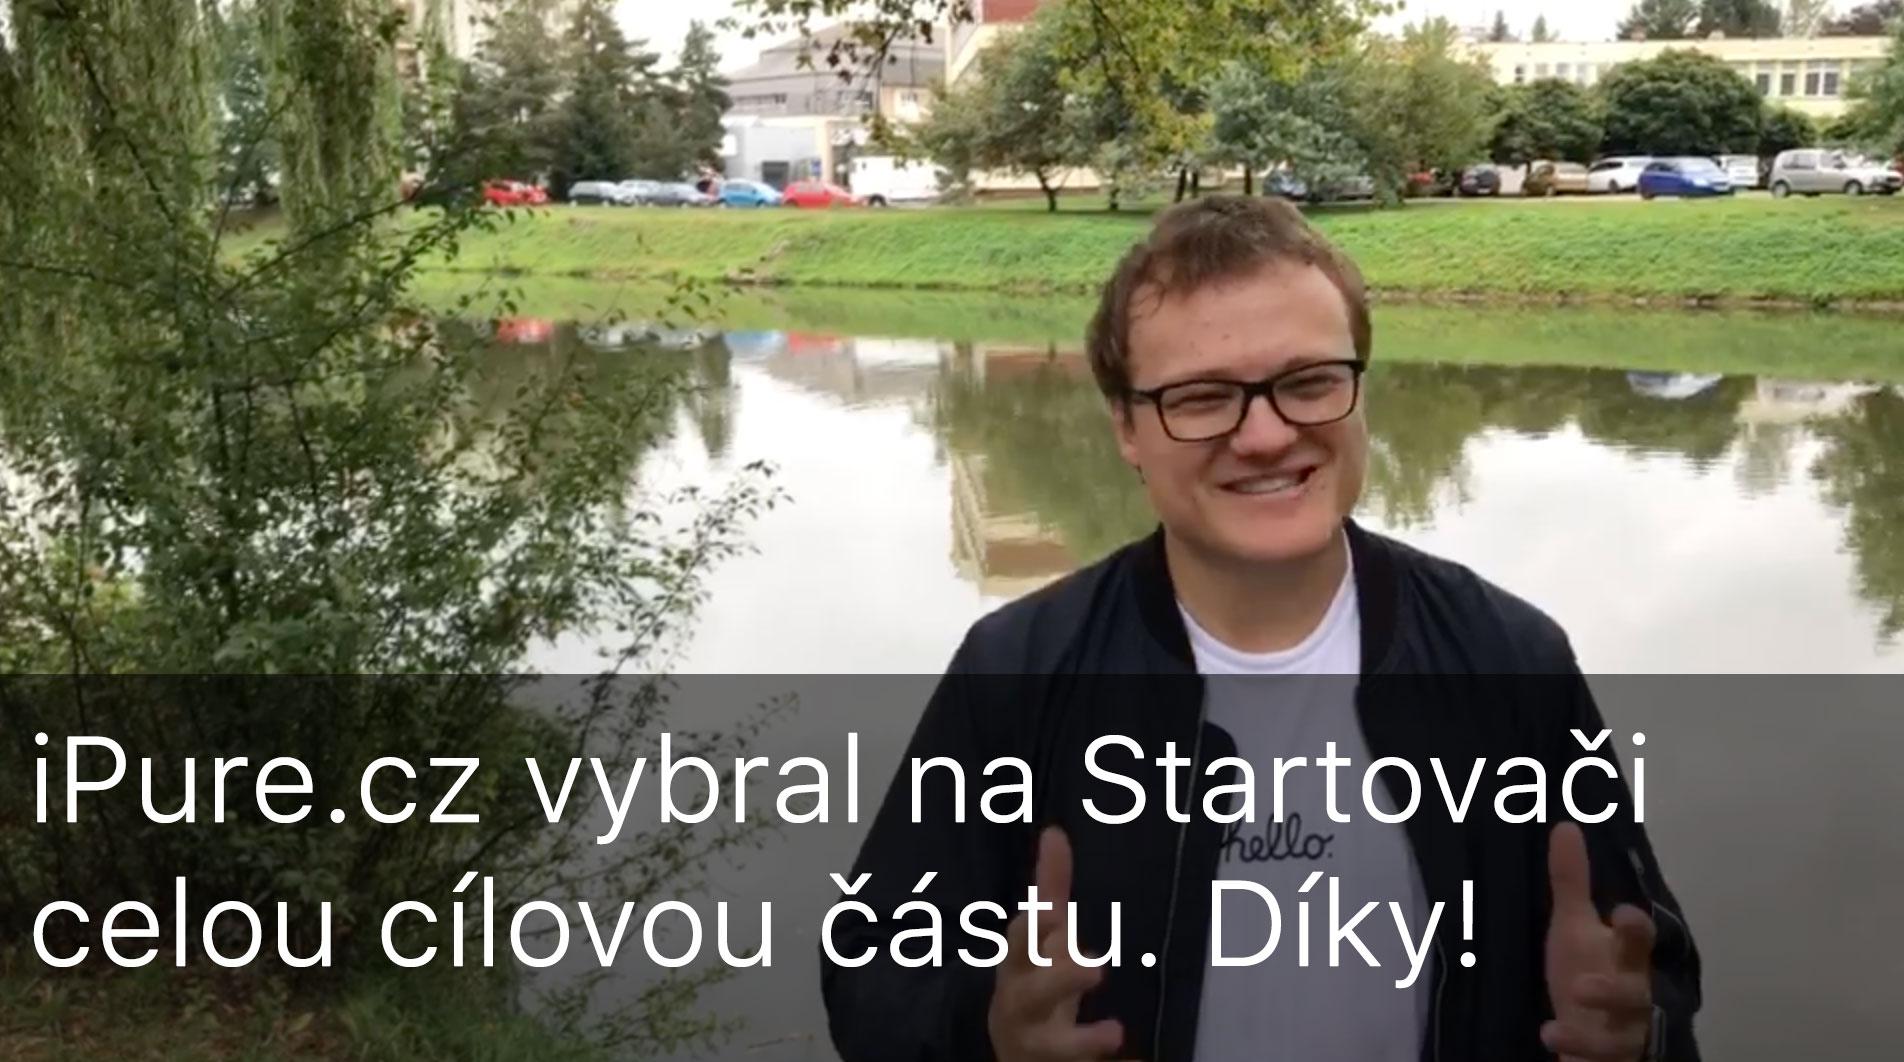 iPure.cz kampaň